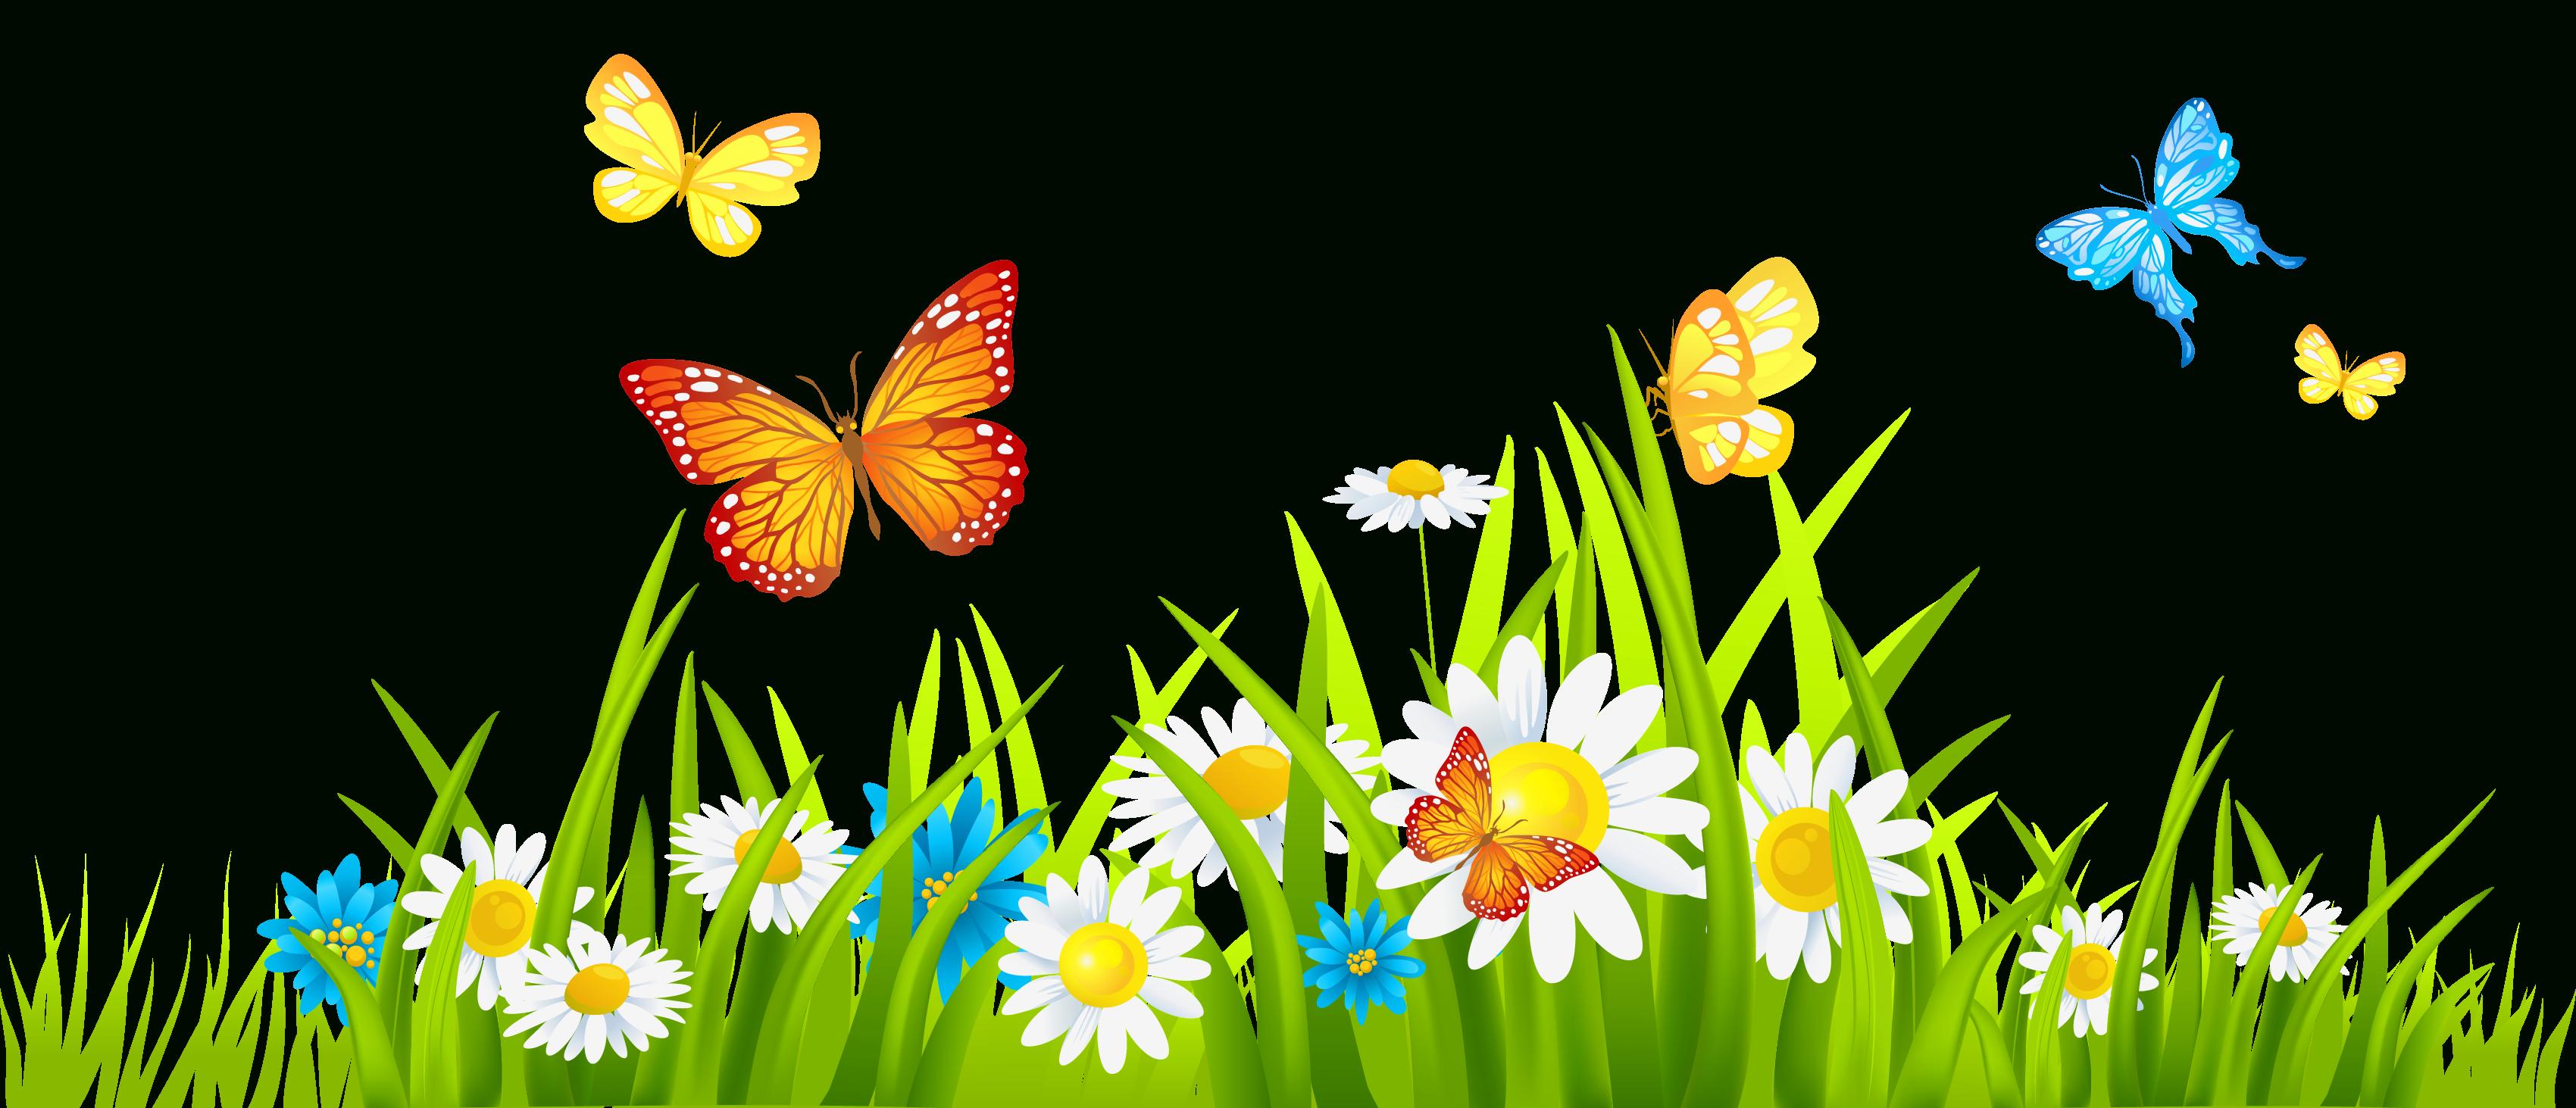 Wonderful of flower png. Clipart free garden